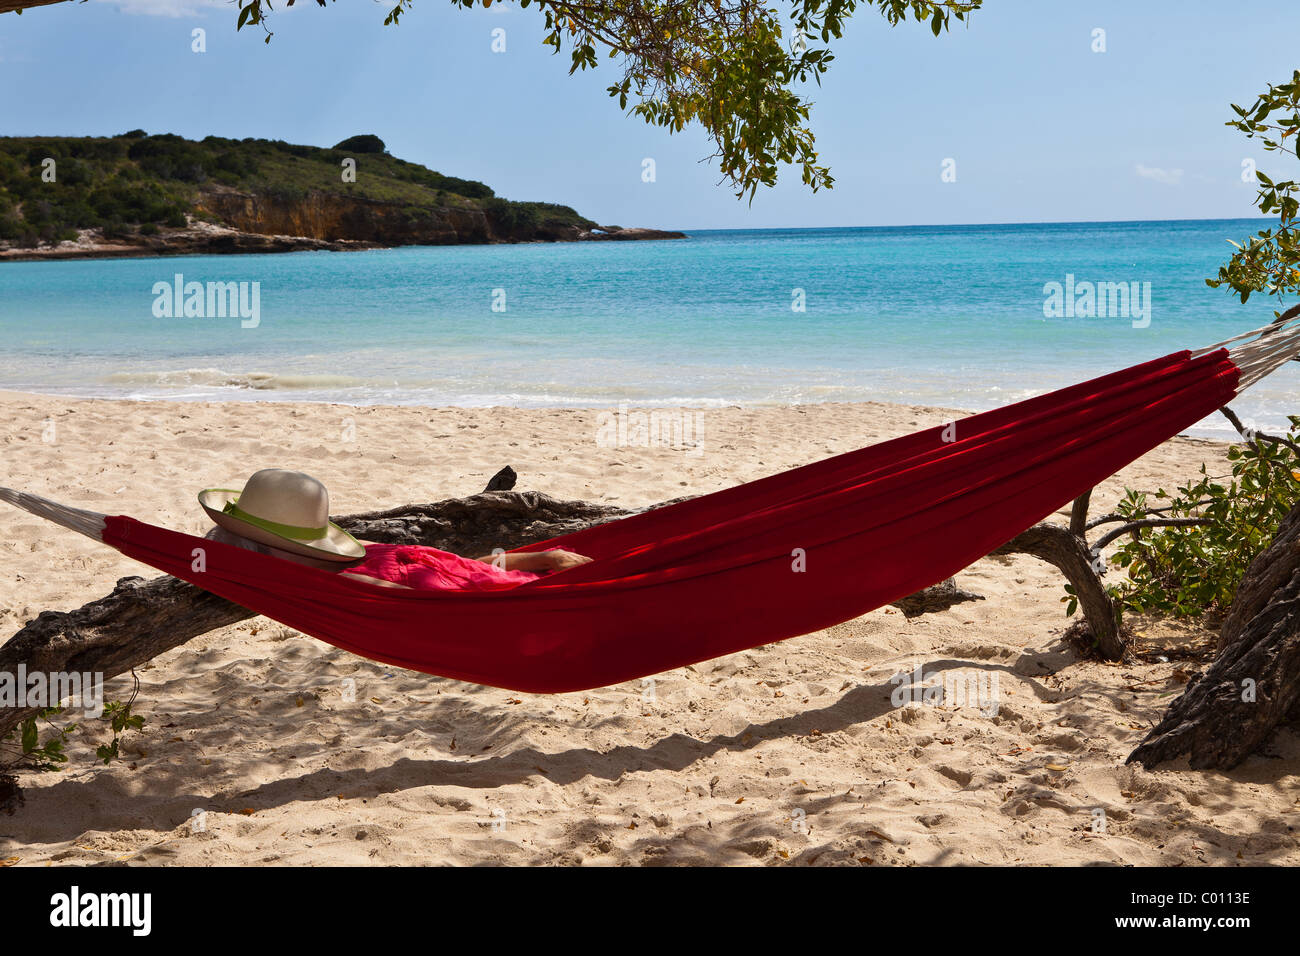 Hammock on La Playuela beach at Cabo Rojo wildlife preserve Puerto Rico - Stock Image